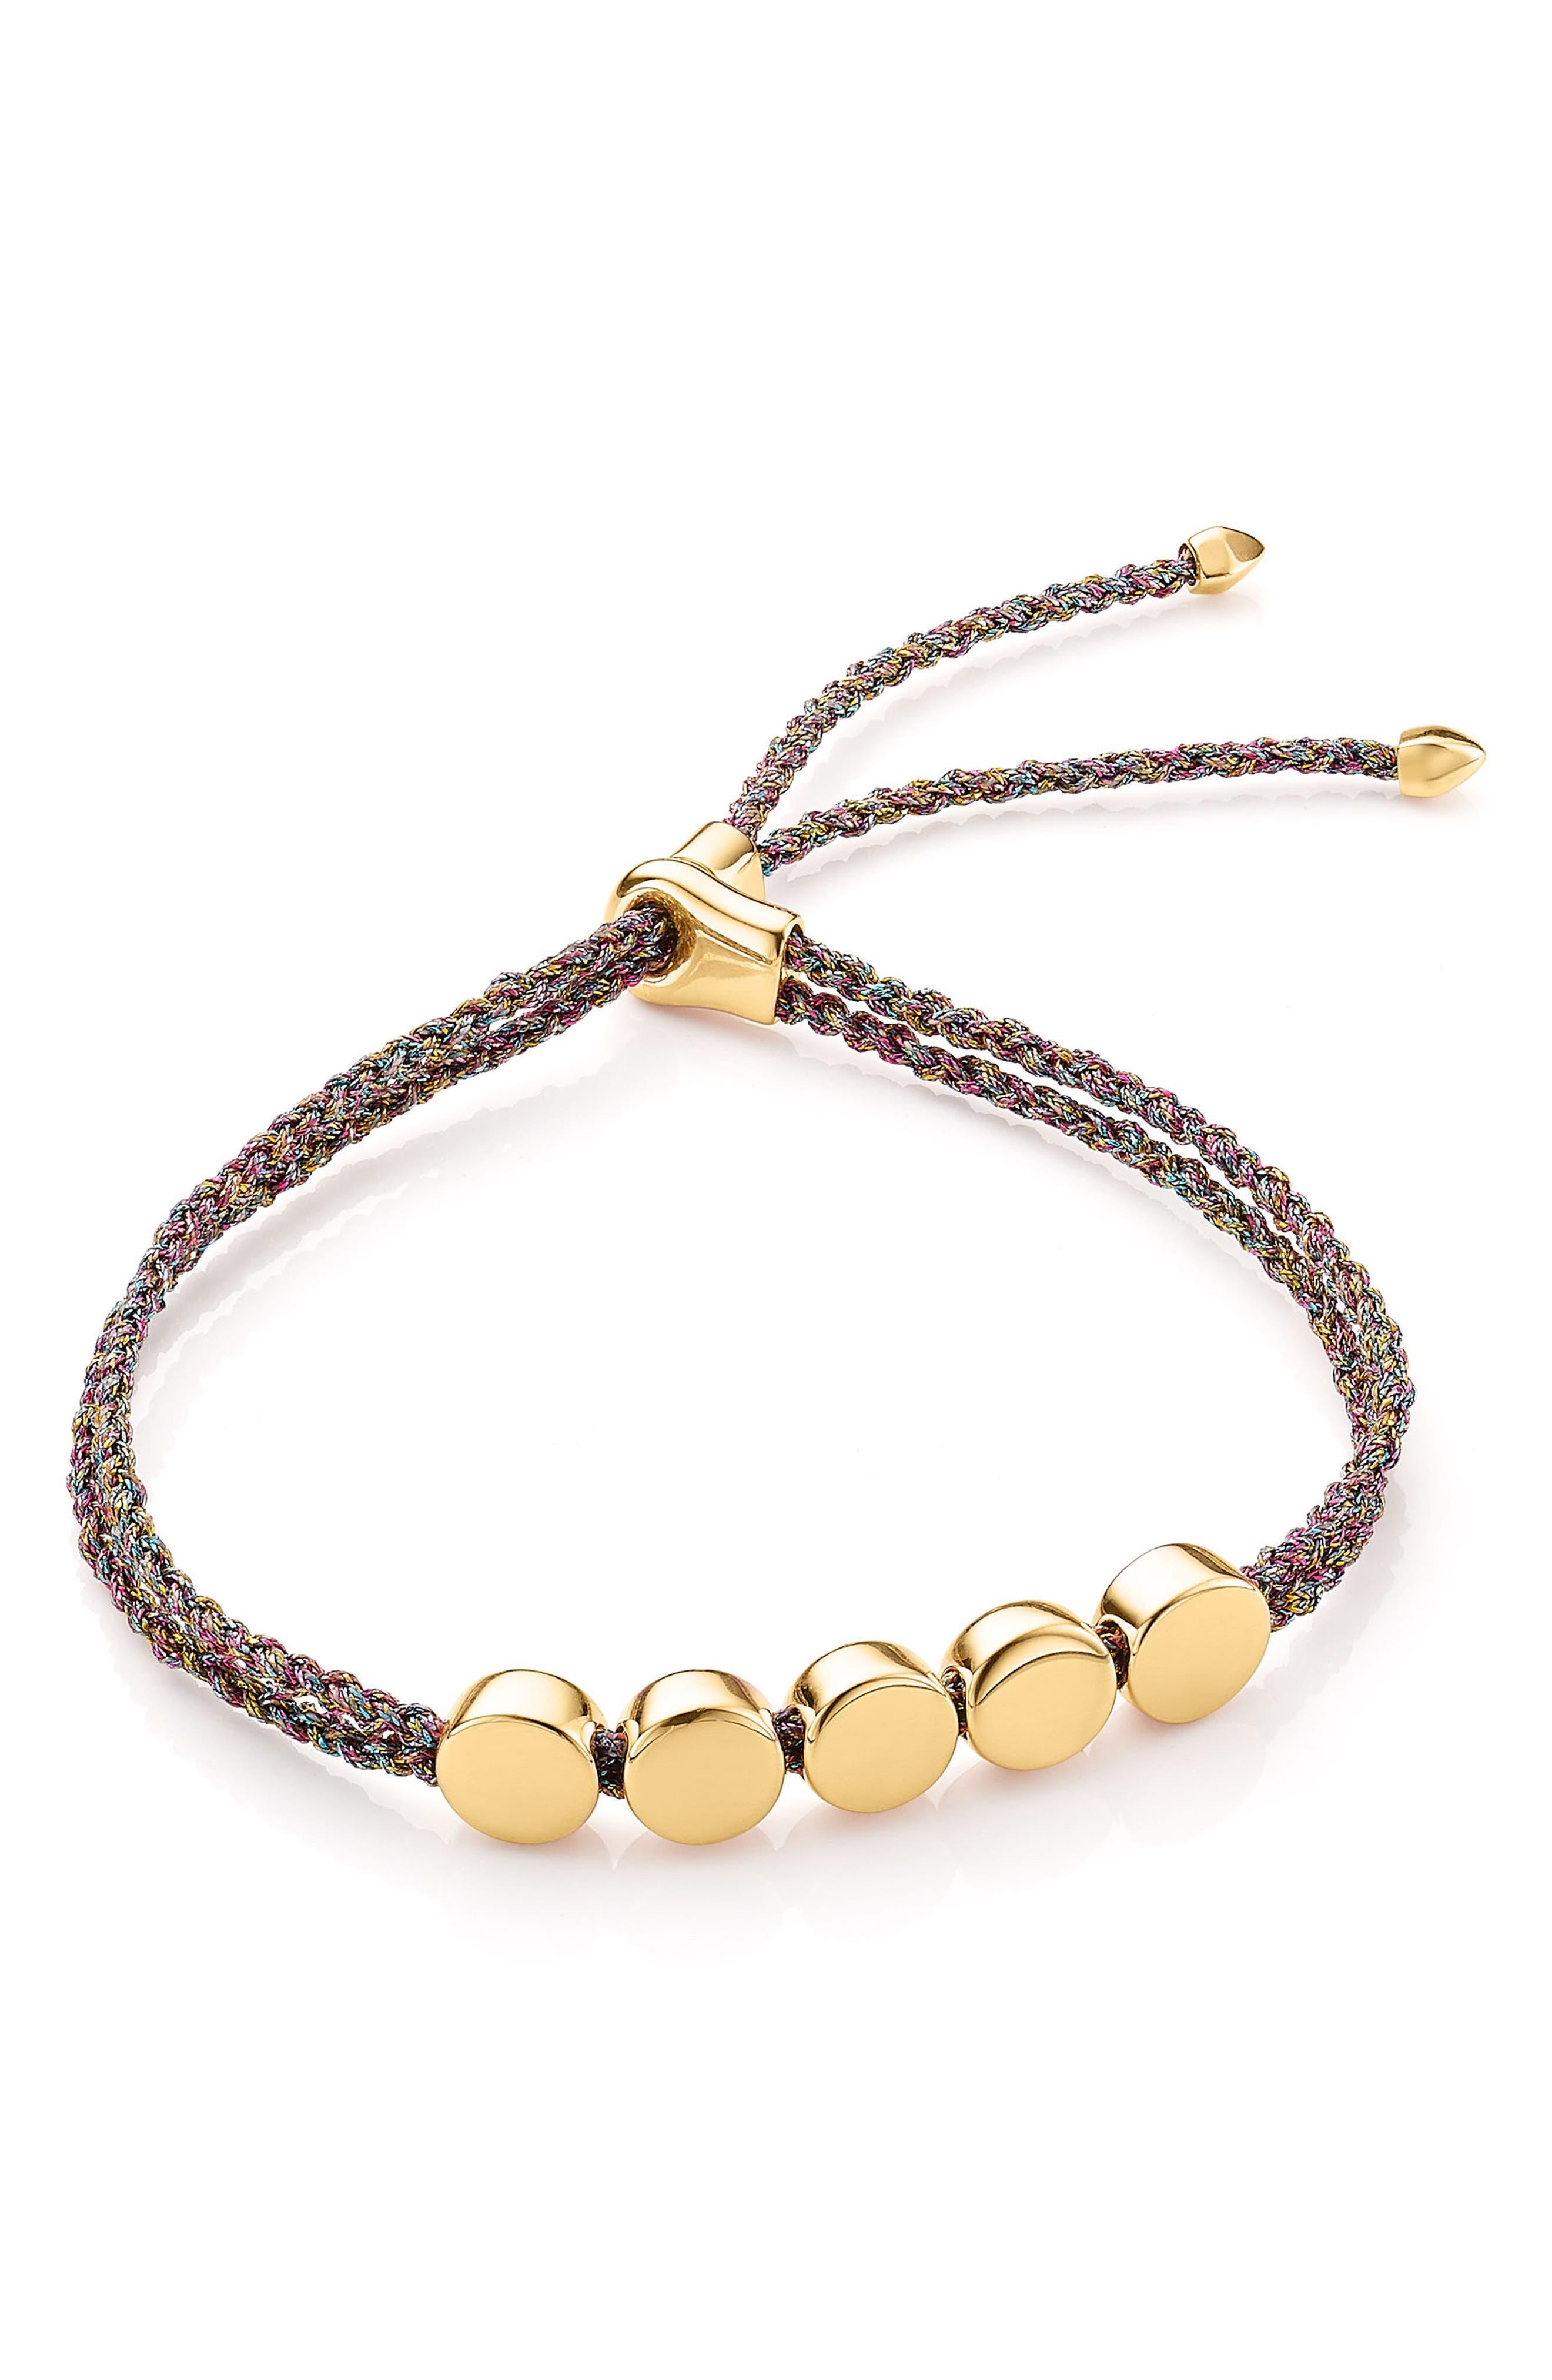 Main Image - Monica Vinader Linear Bead Friendship Bracelet